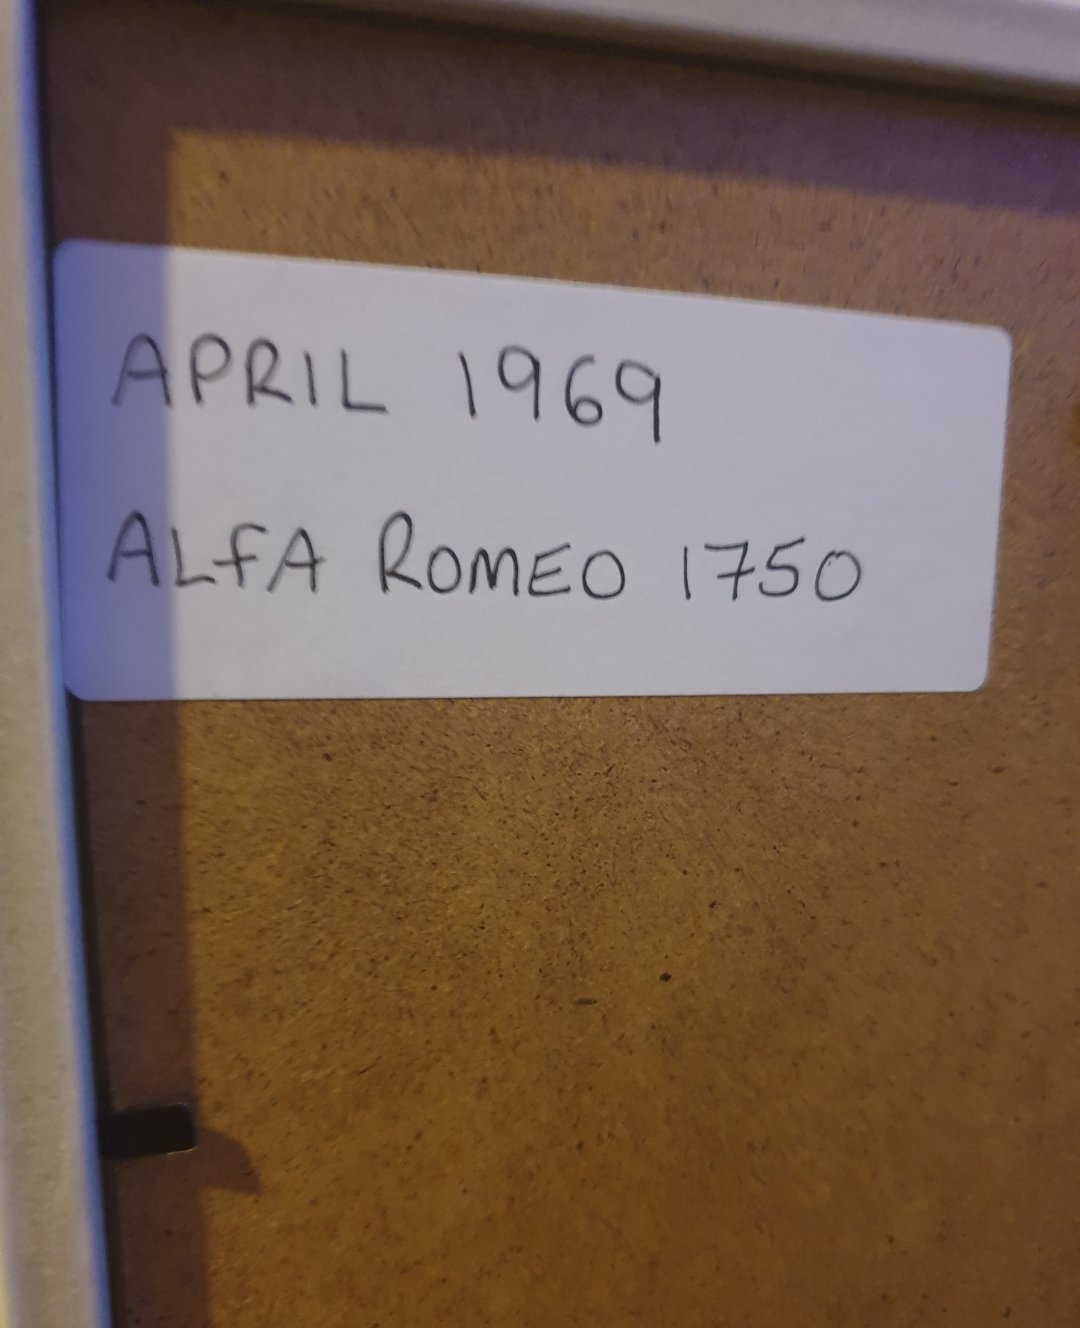 Original 1969 Alfa Romeo 1750 Advert For Sale (picture 2 of 2)